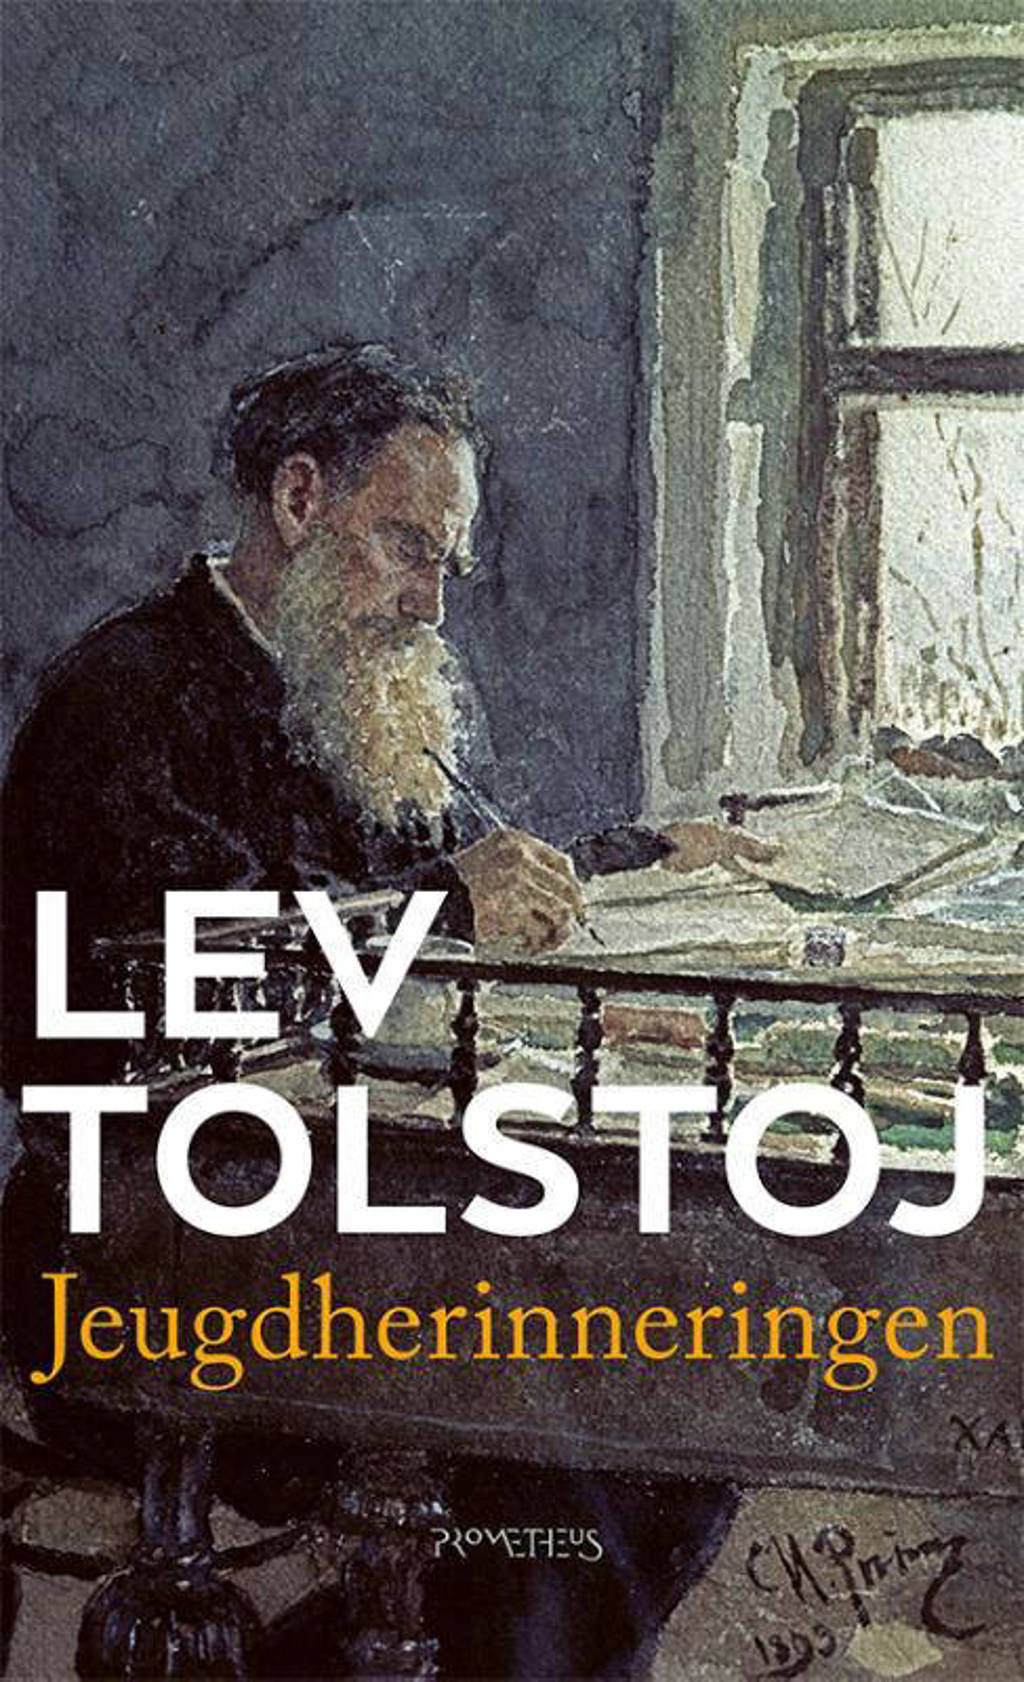 Jeugdherinneringen - Lev Tolstoj